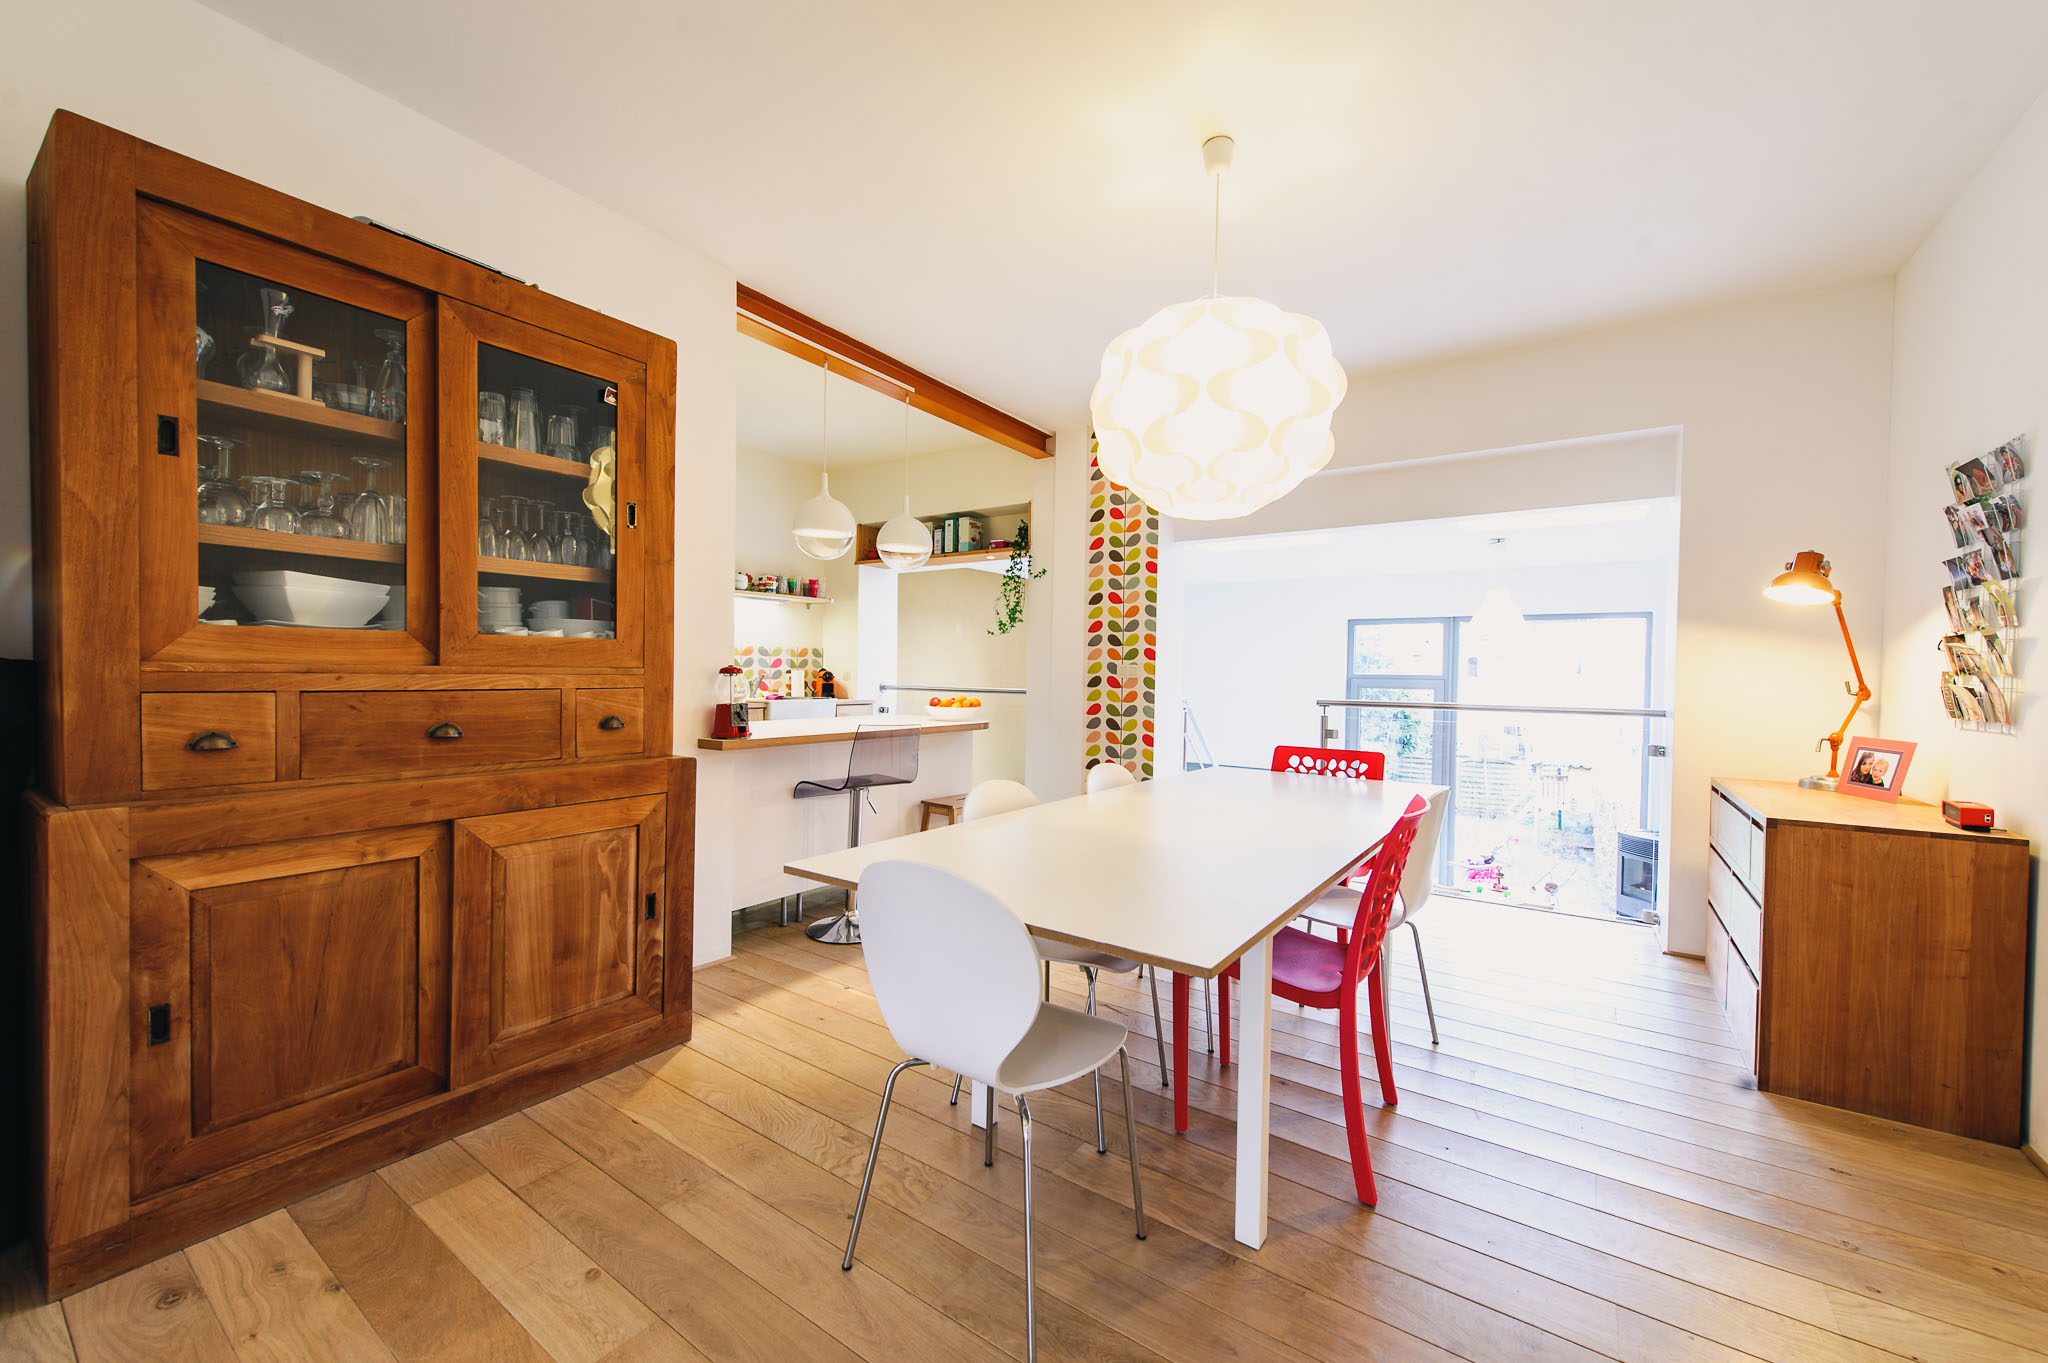 transformation structurelle d 39 une habitation li ge. Black Bedroom Furniture Sets. Home Design Ideas